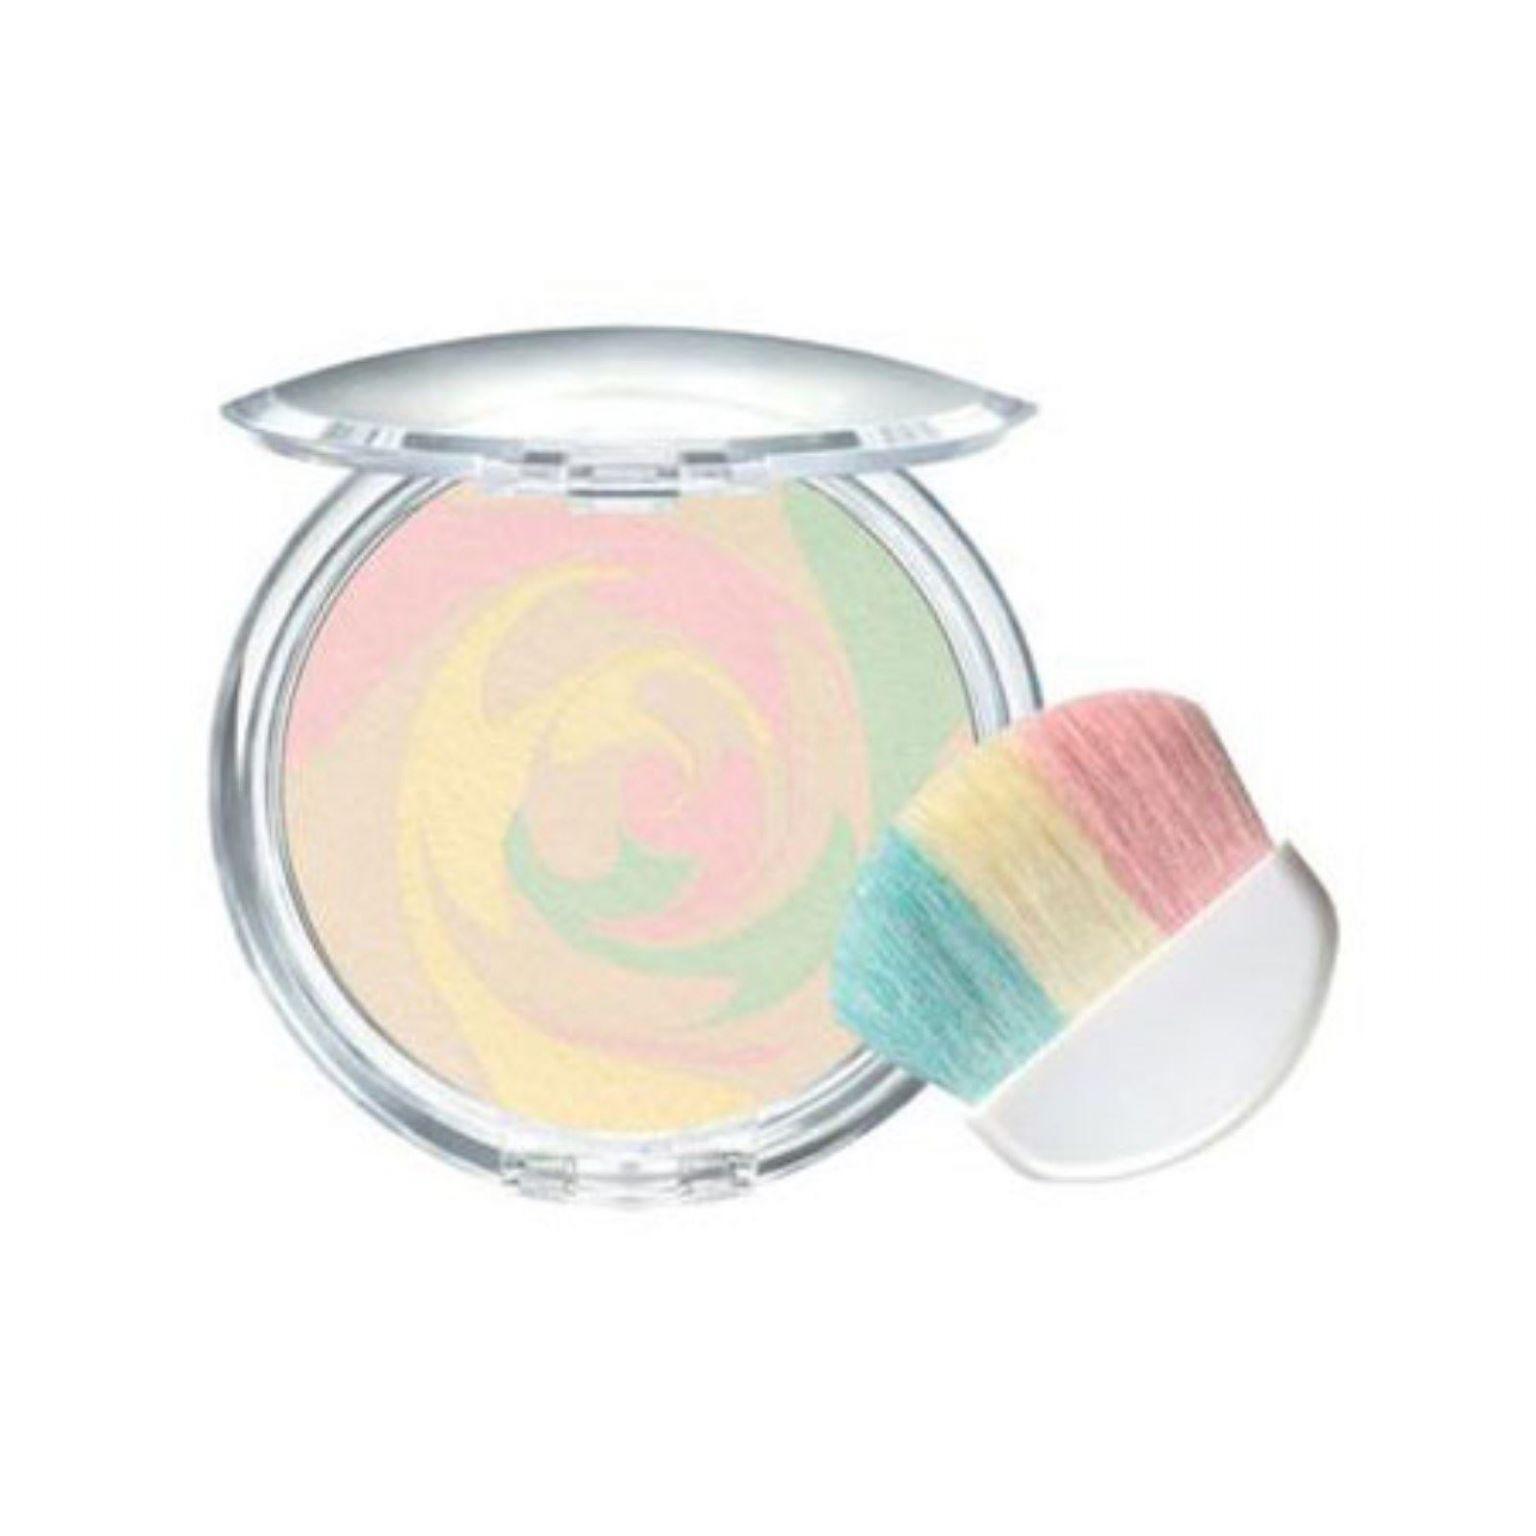 Mineral Wear Talc-Free Mineral Correcting Powder - Translucent